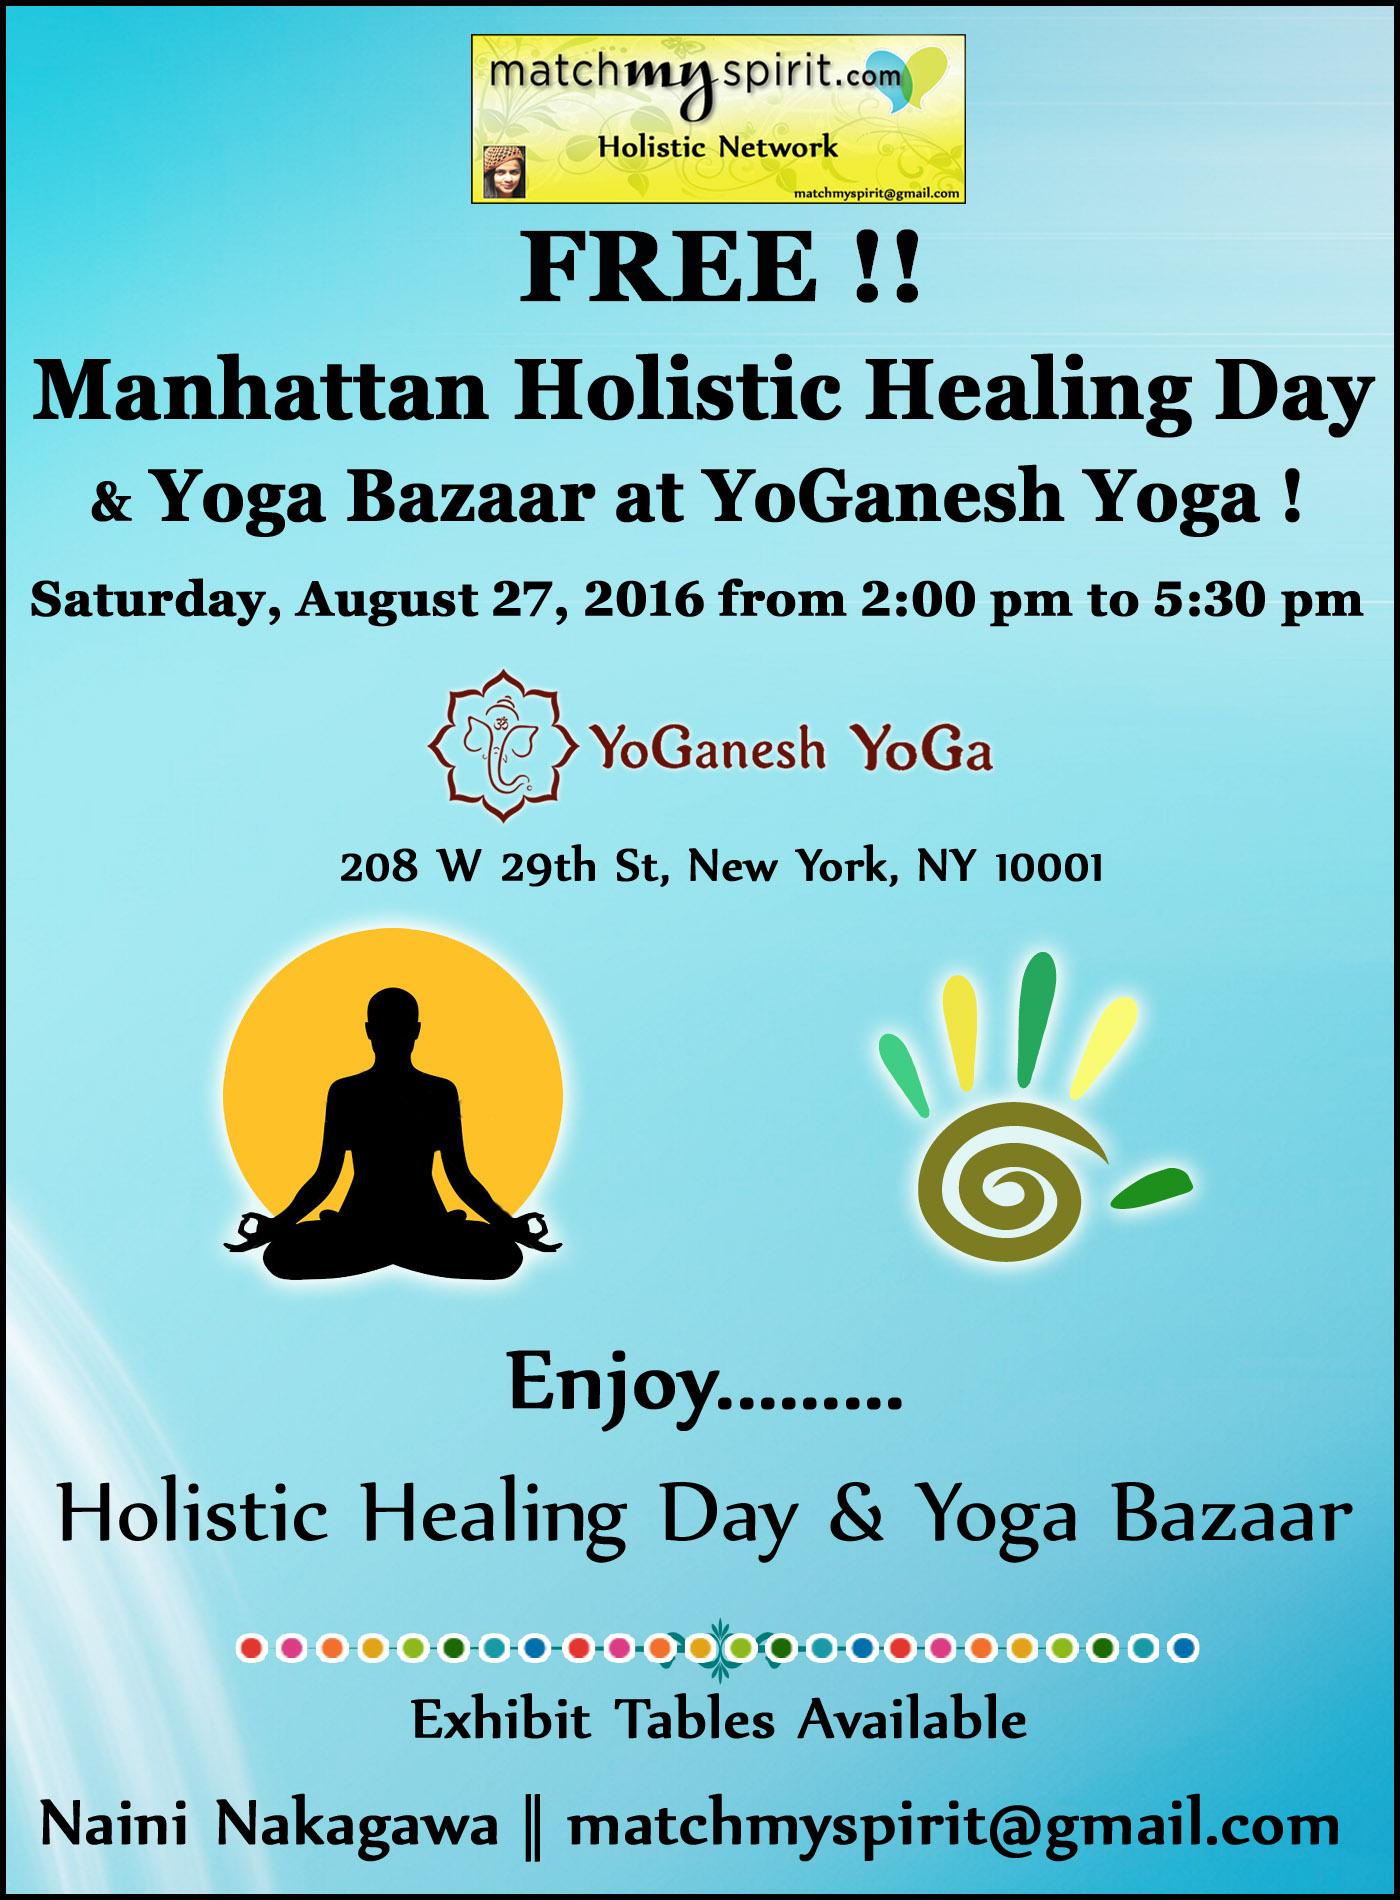 FREE!! Manhattan Holistic Healing Day & Yoga Bazaar !